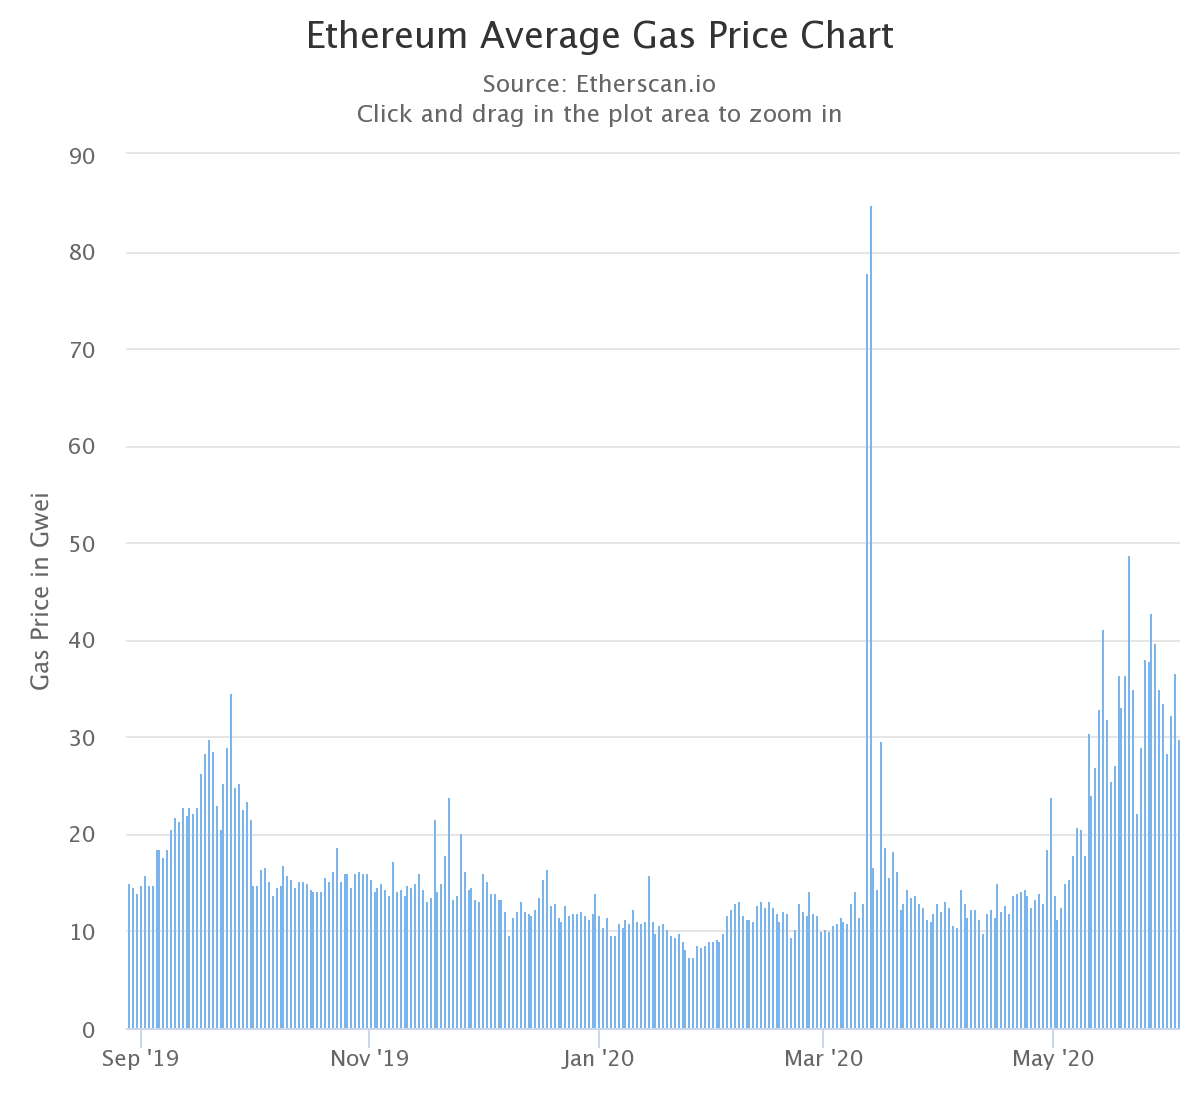 Ethereum Average Gas Price Chart